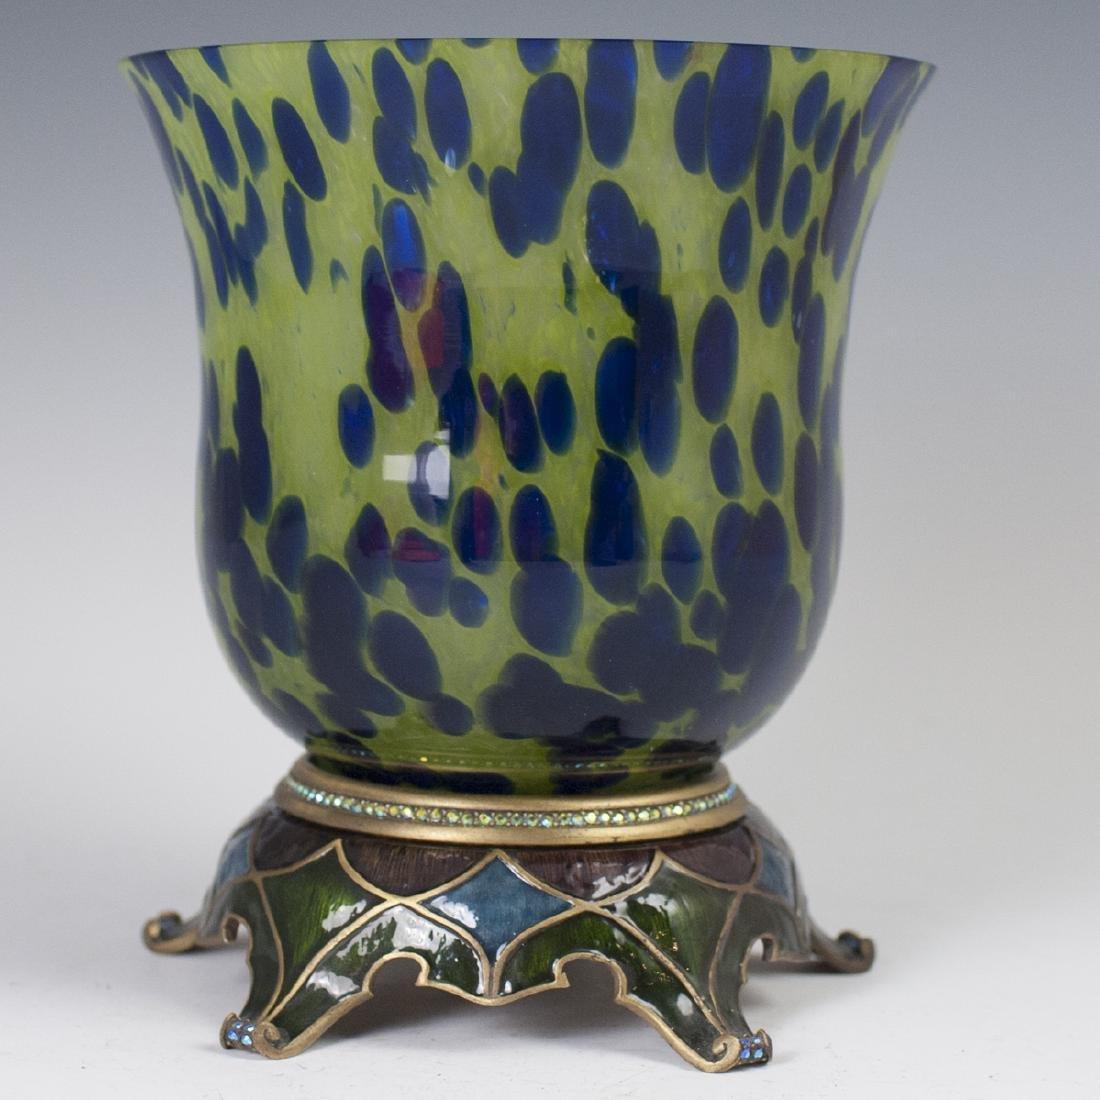 Jay Strongwater Enamel & Glass Vase